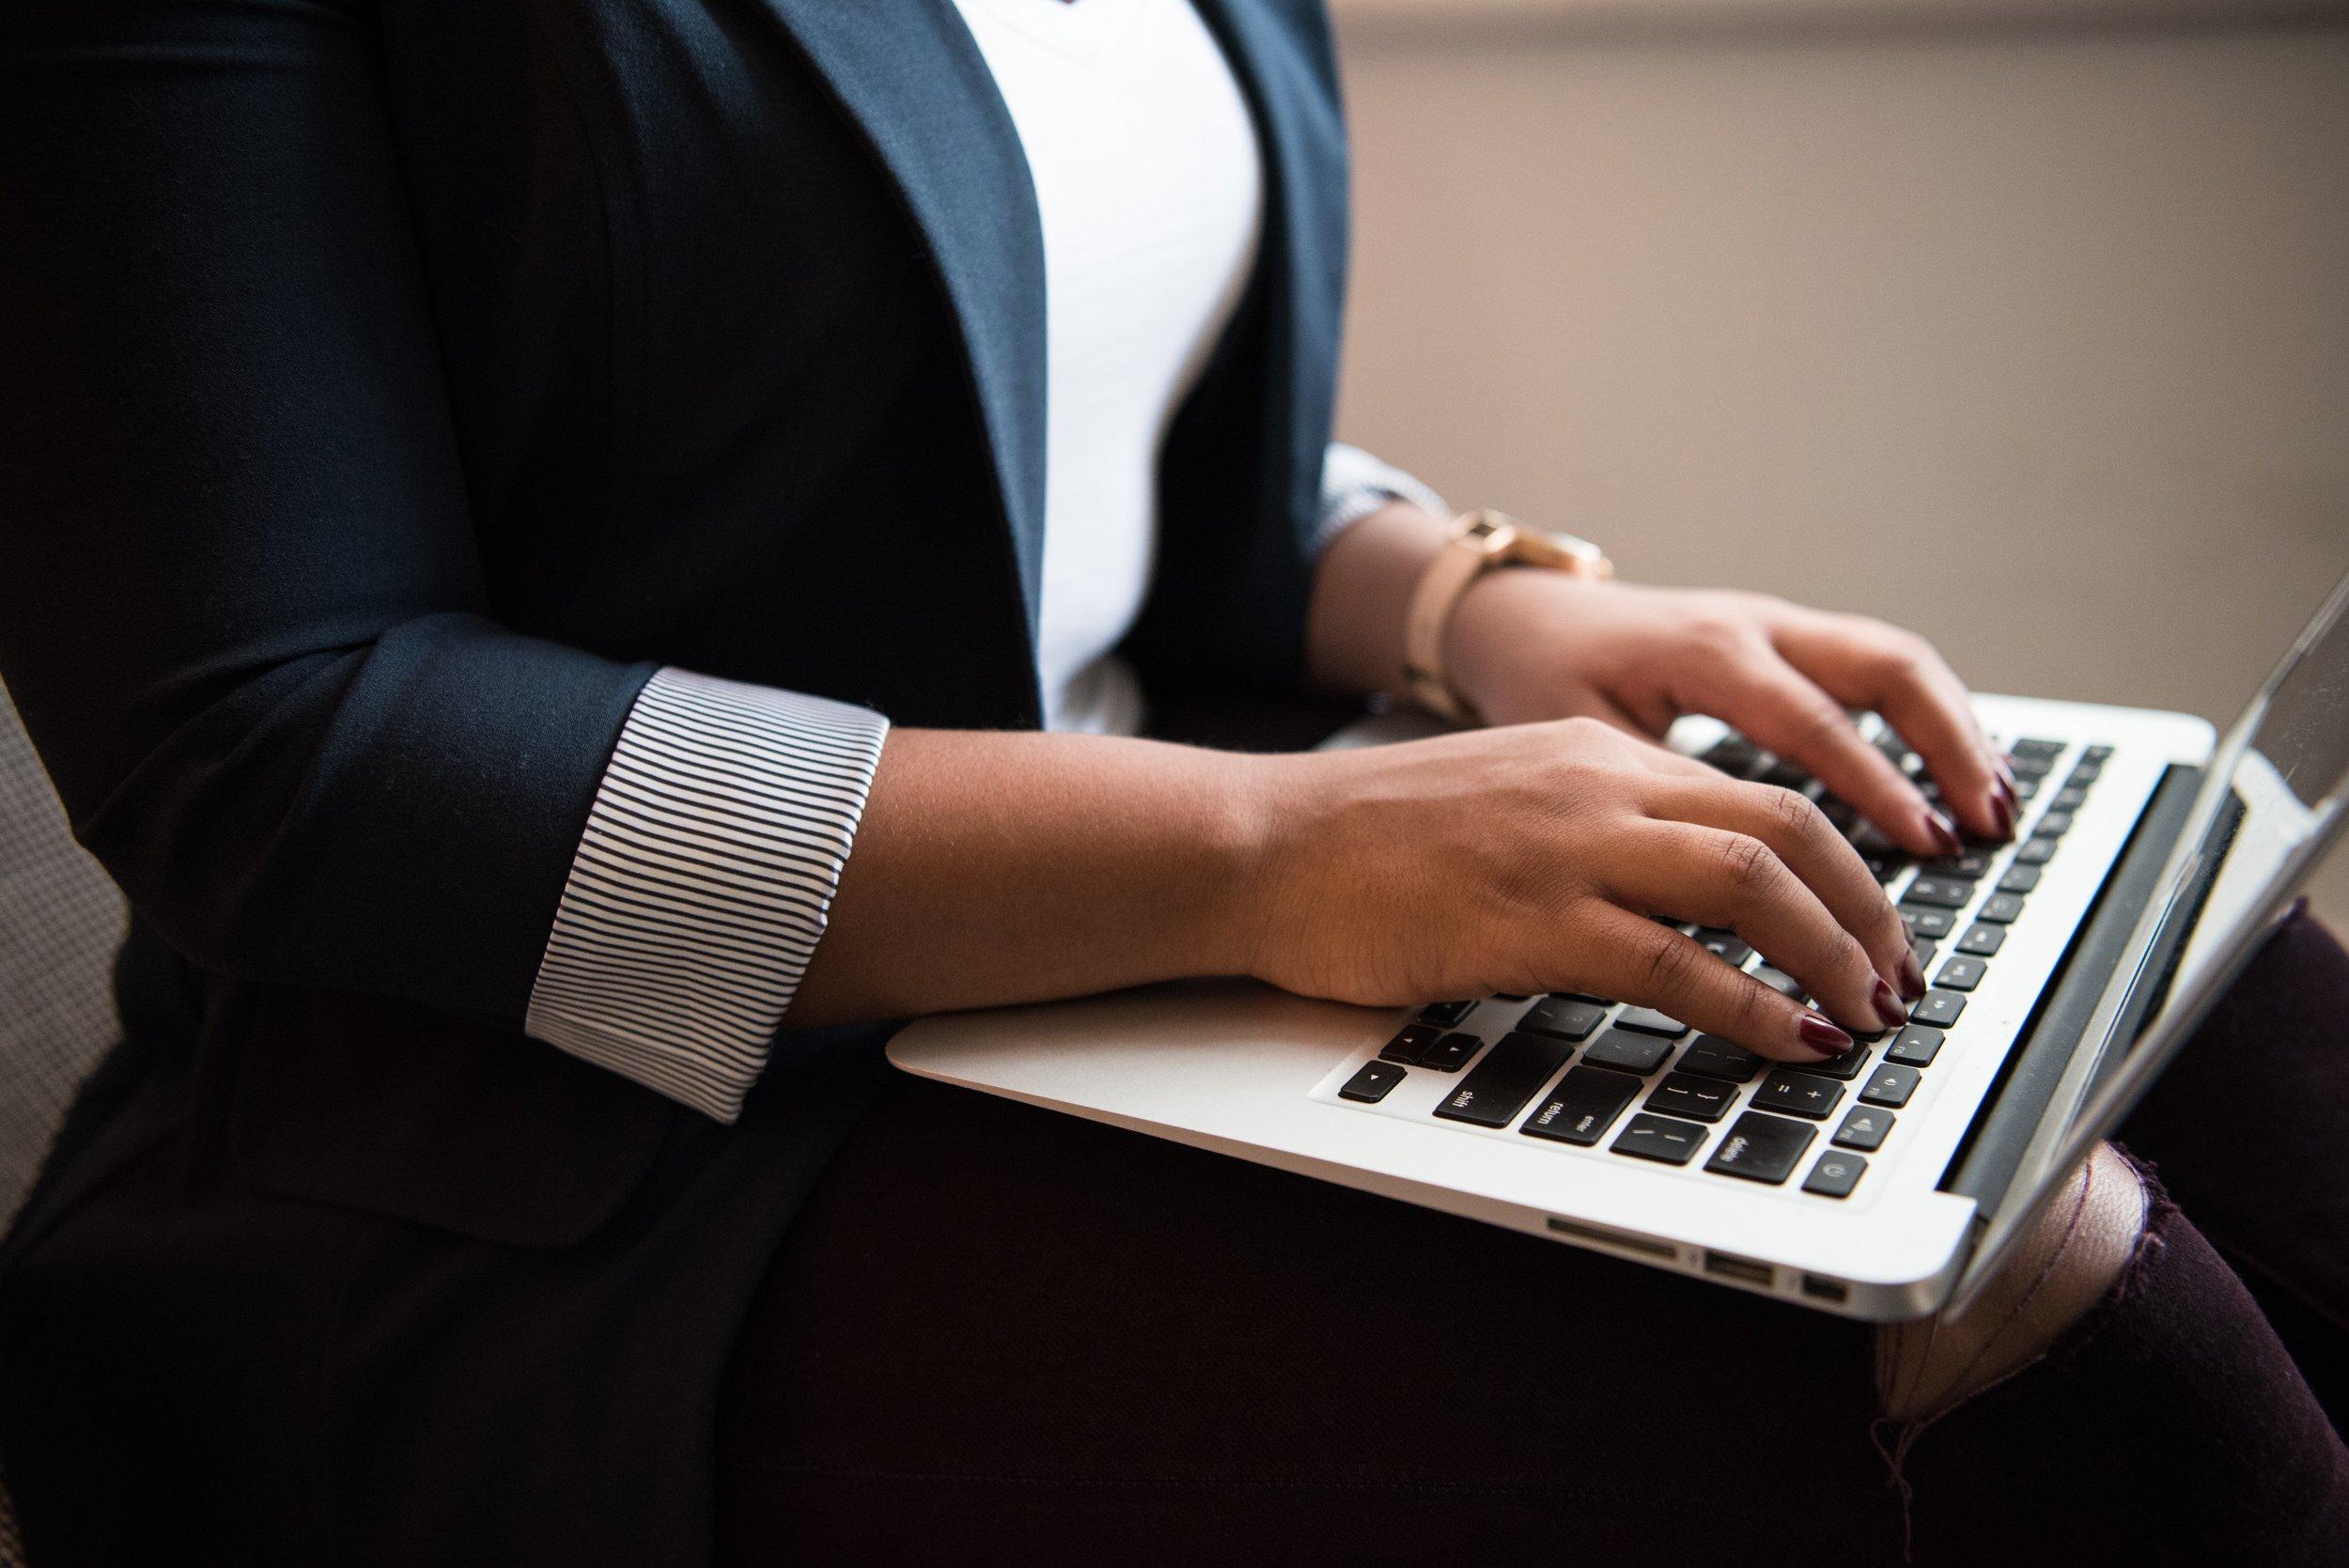 adult-businesswoman-connection-1181555.jpg